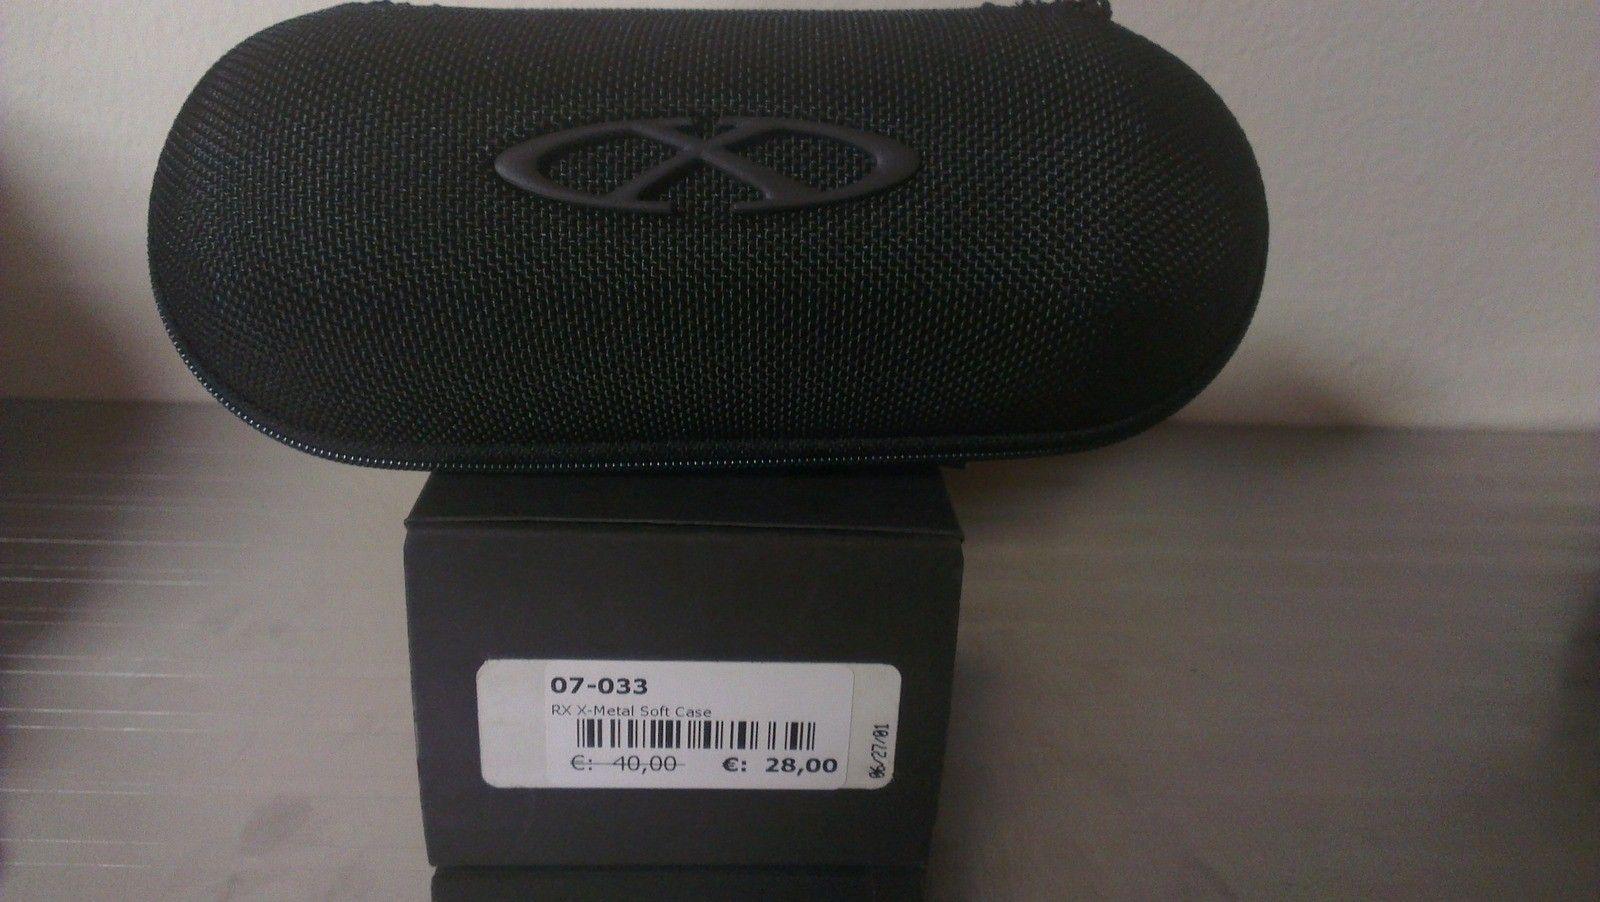 Oakley XMETAL Soft Vault 07-027 (complete W/ Box) - 4zqzj2p3.jpg